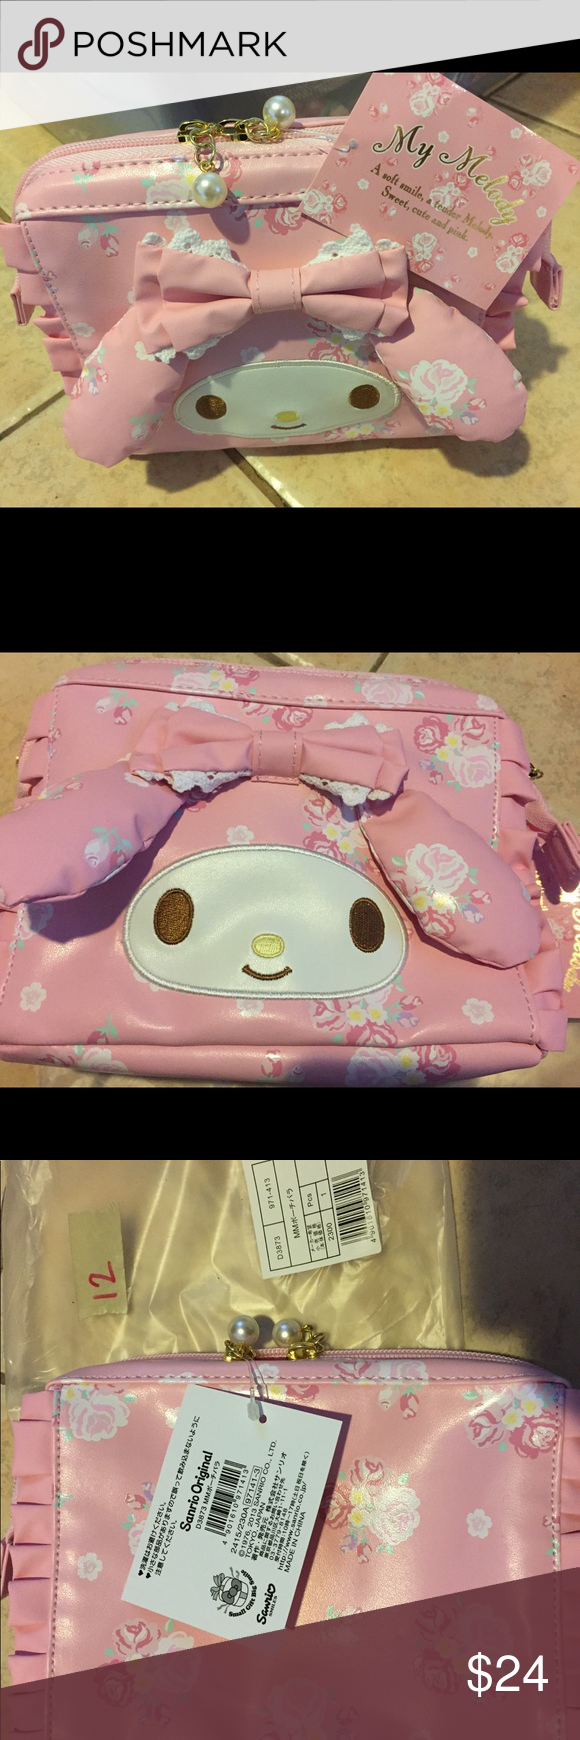 SOLD🎶imported Sanrio My Melody cosmetic bag Sanrio bag